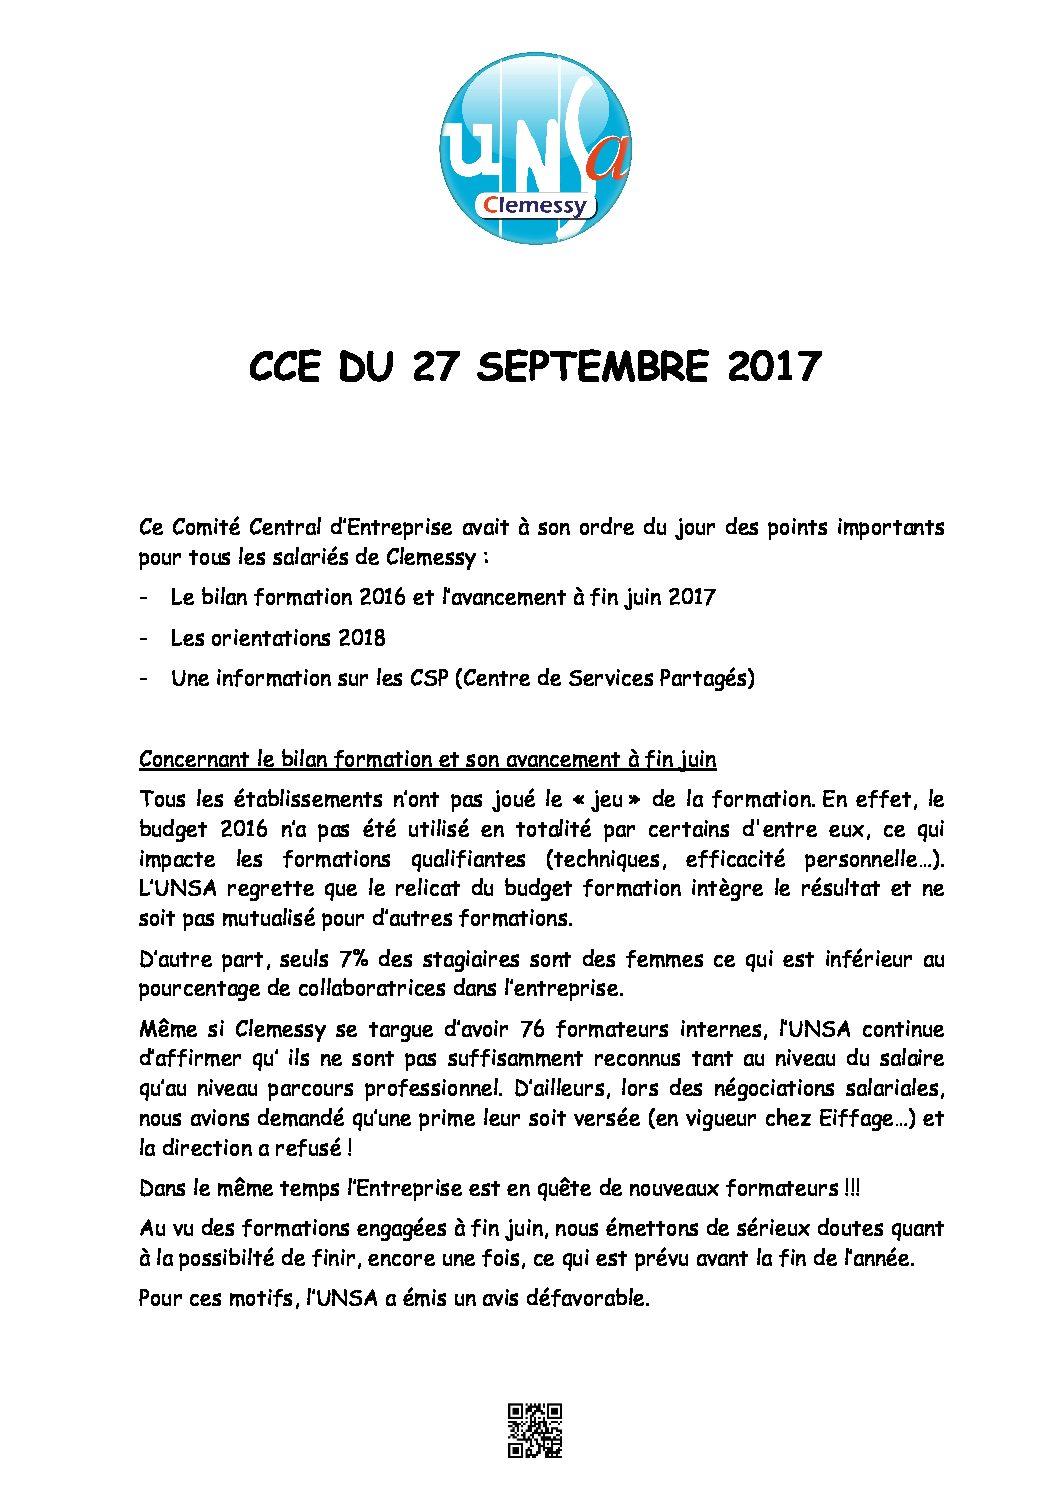 CCE-27-sept-2017